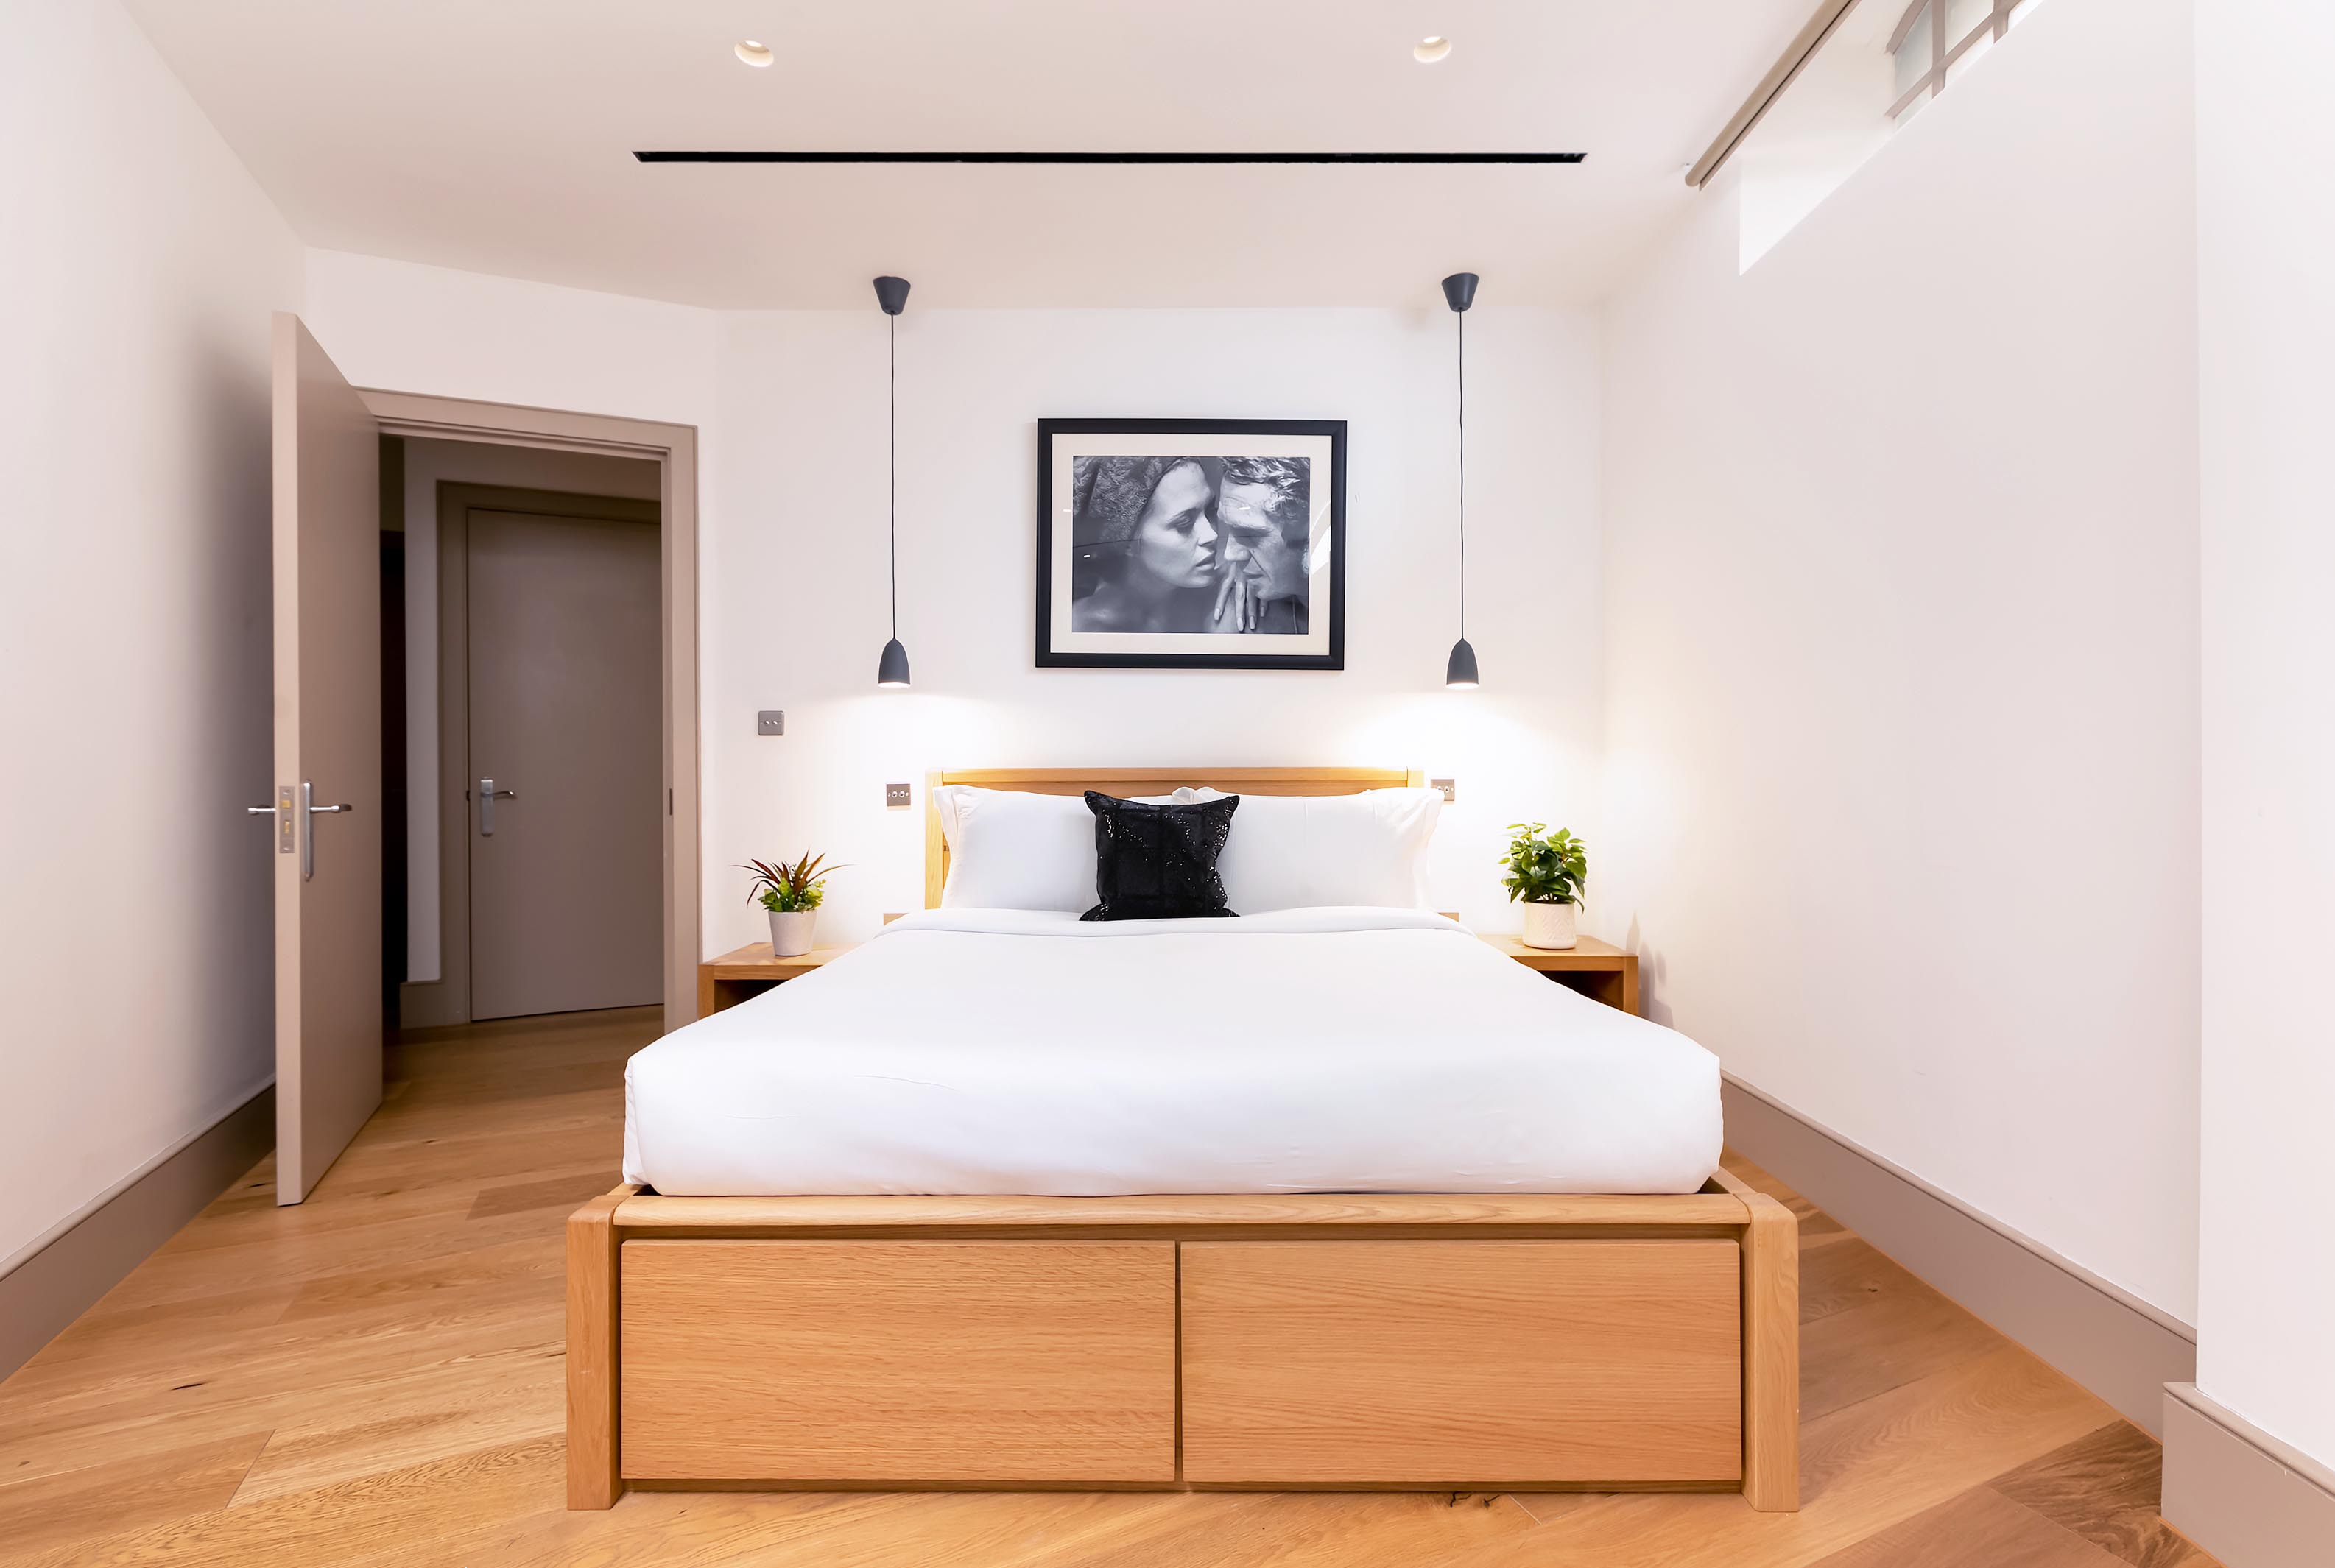 Lovelydays luxury service apartment rental - London - Fitzrovia - Wells Mews B - Lovelysuite - 2 bedrooms - 2 bathrooms - Double bed - 3fecddd2ac8e - Lovelydays